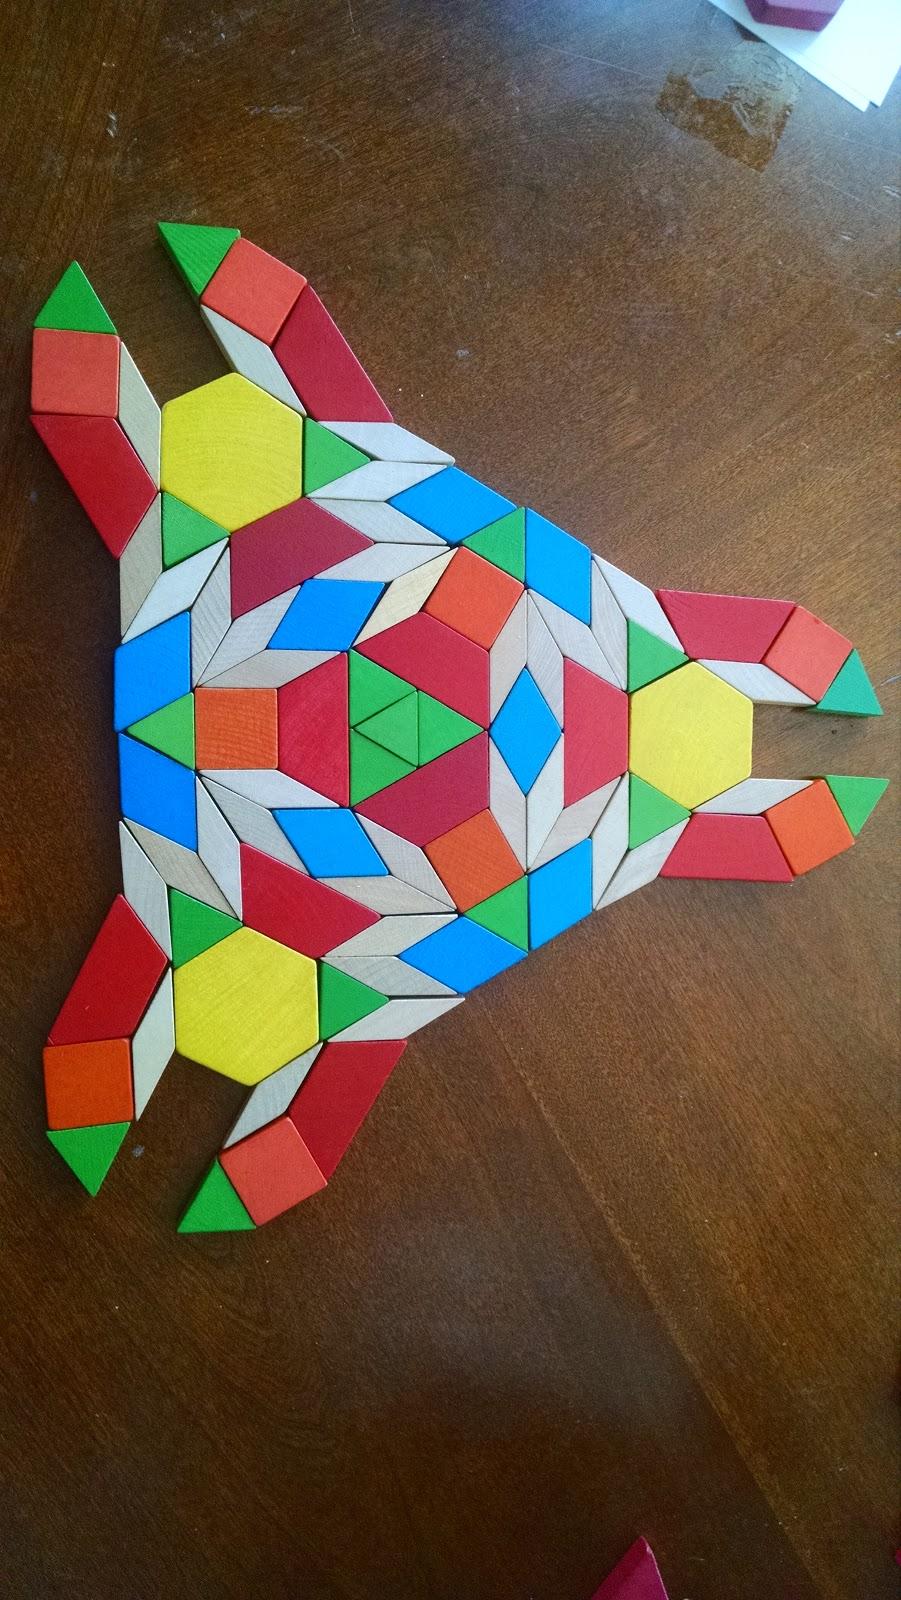 Kids Math Teacher Cool Shapes To Make With Pattern Blocks